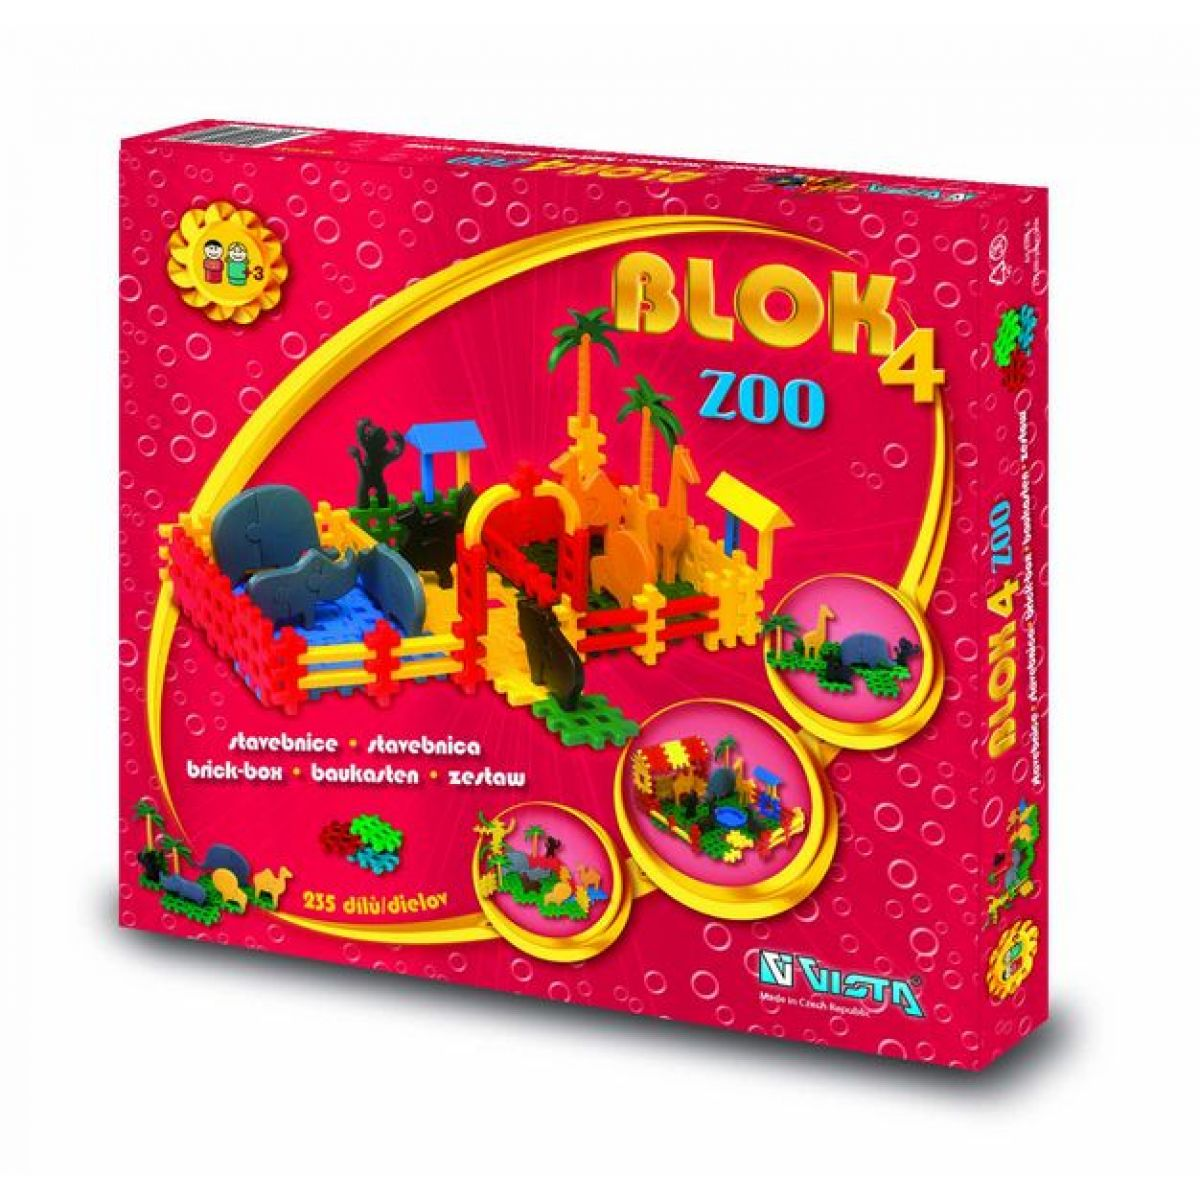 Vista Blok&Blok 4 - Zoo